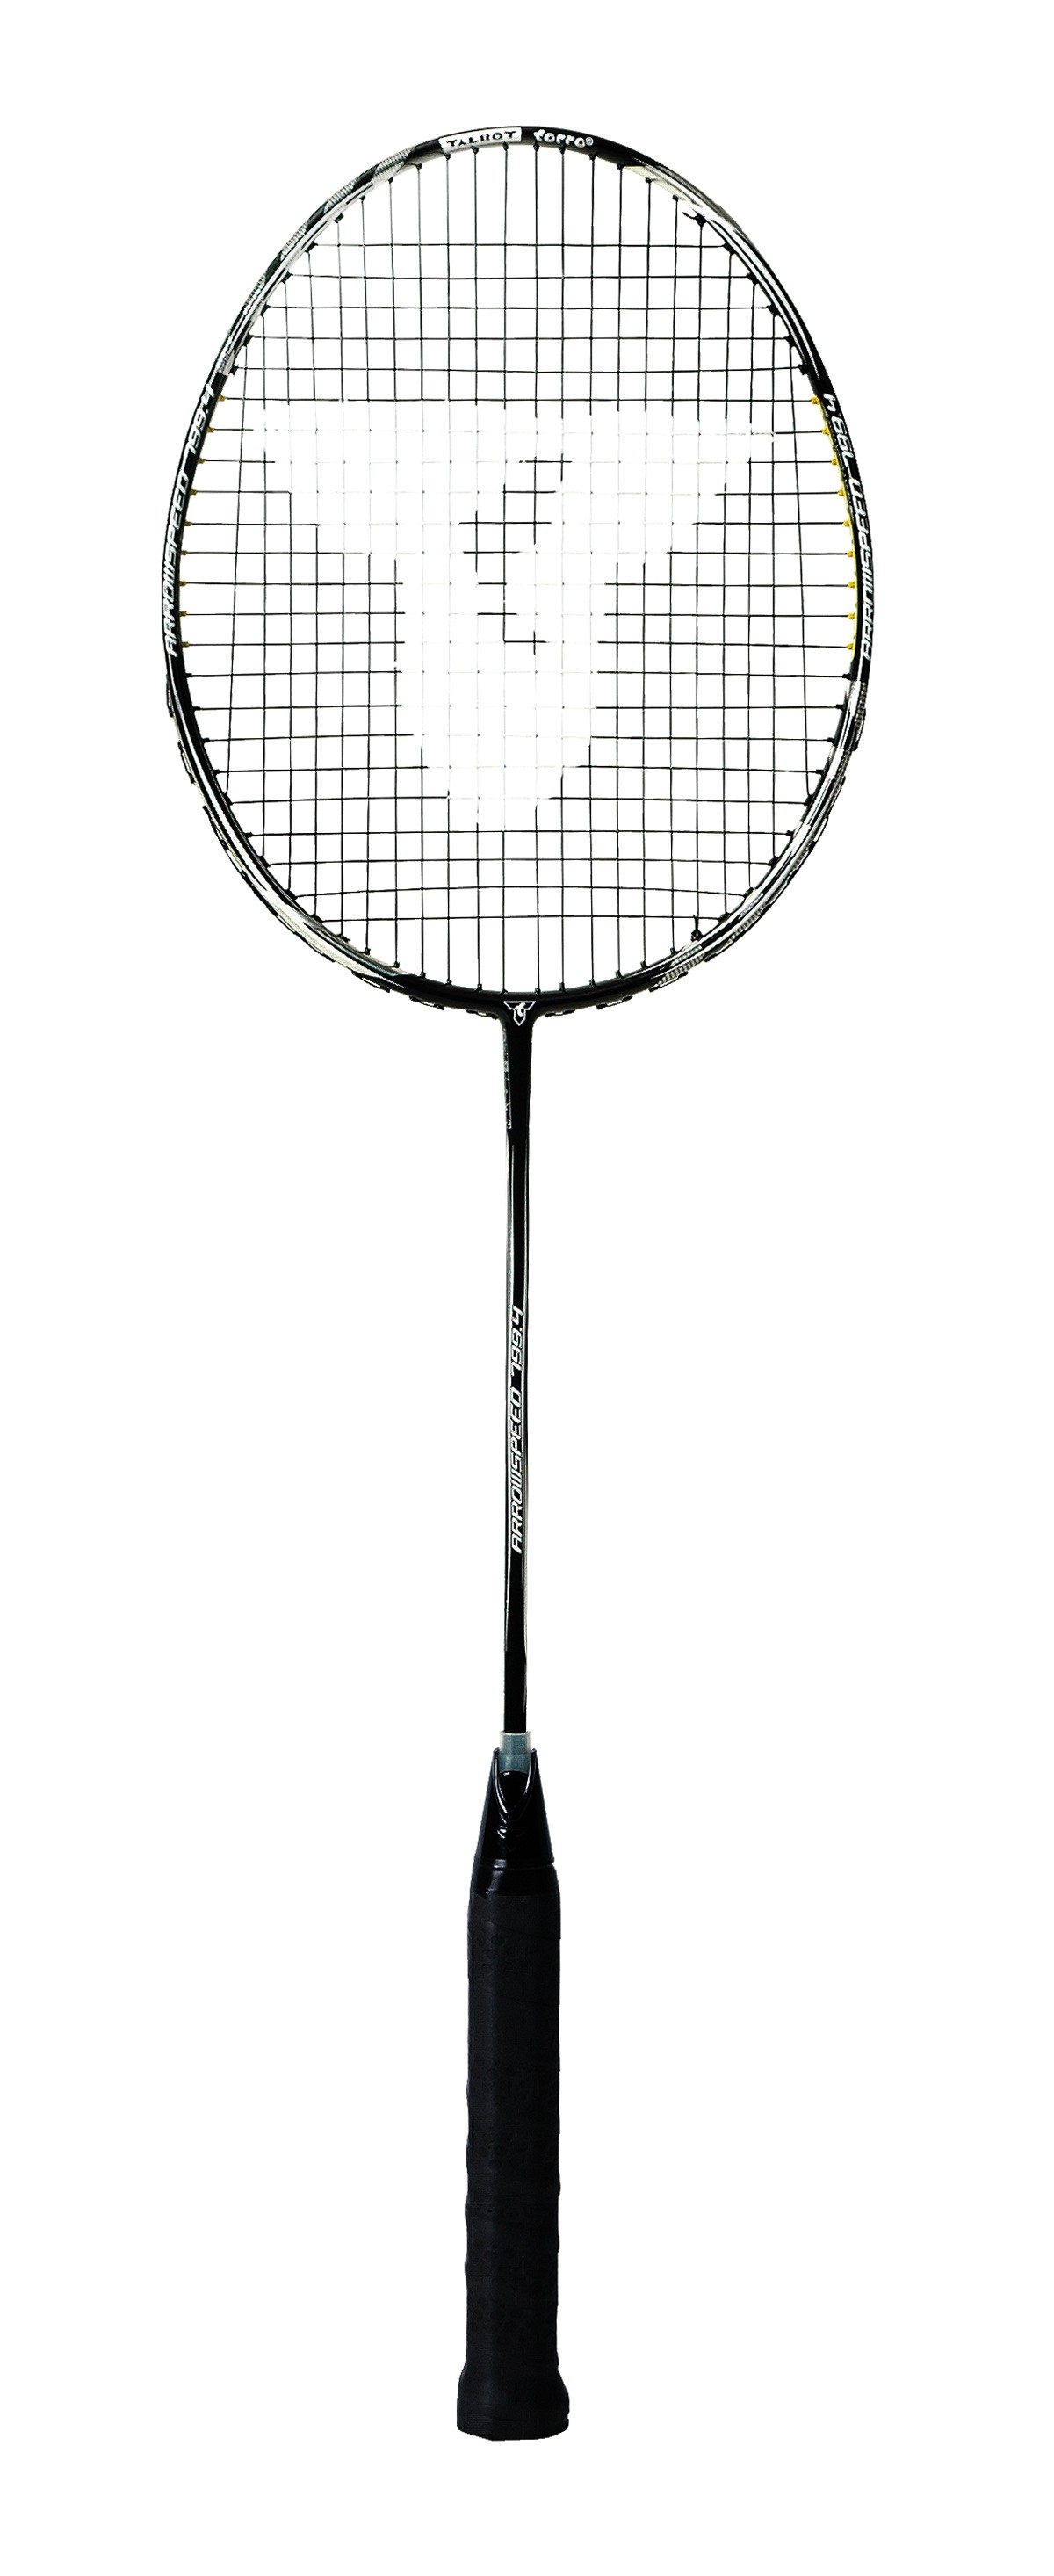 Racheta Badminton  Talbot Torro  Arrowspeed 799.4  85 G